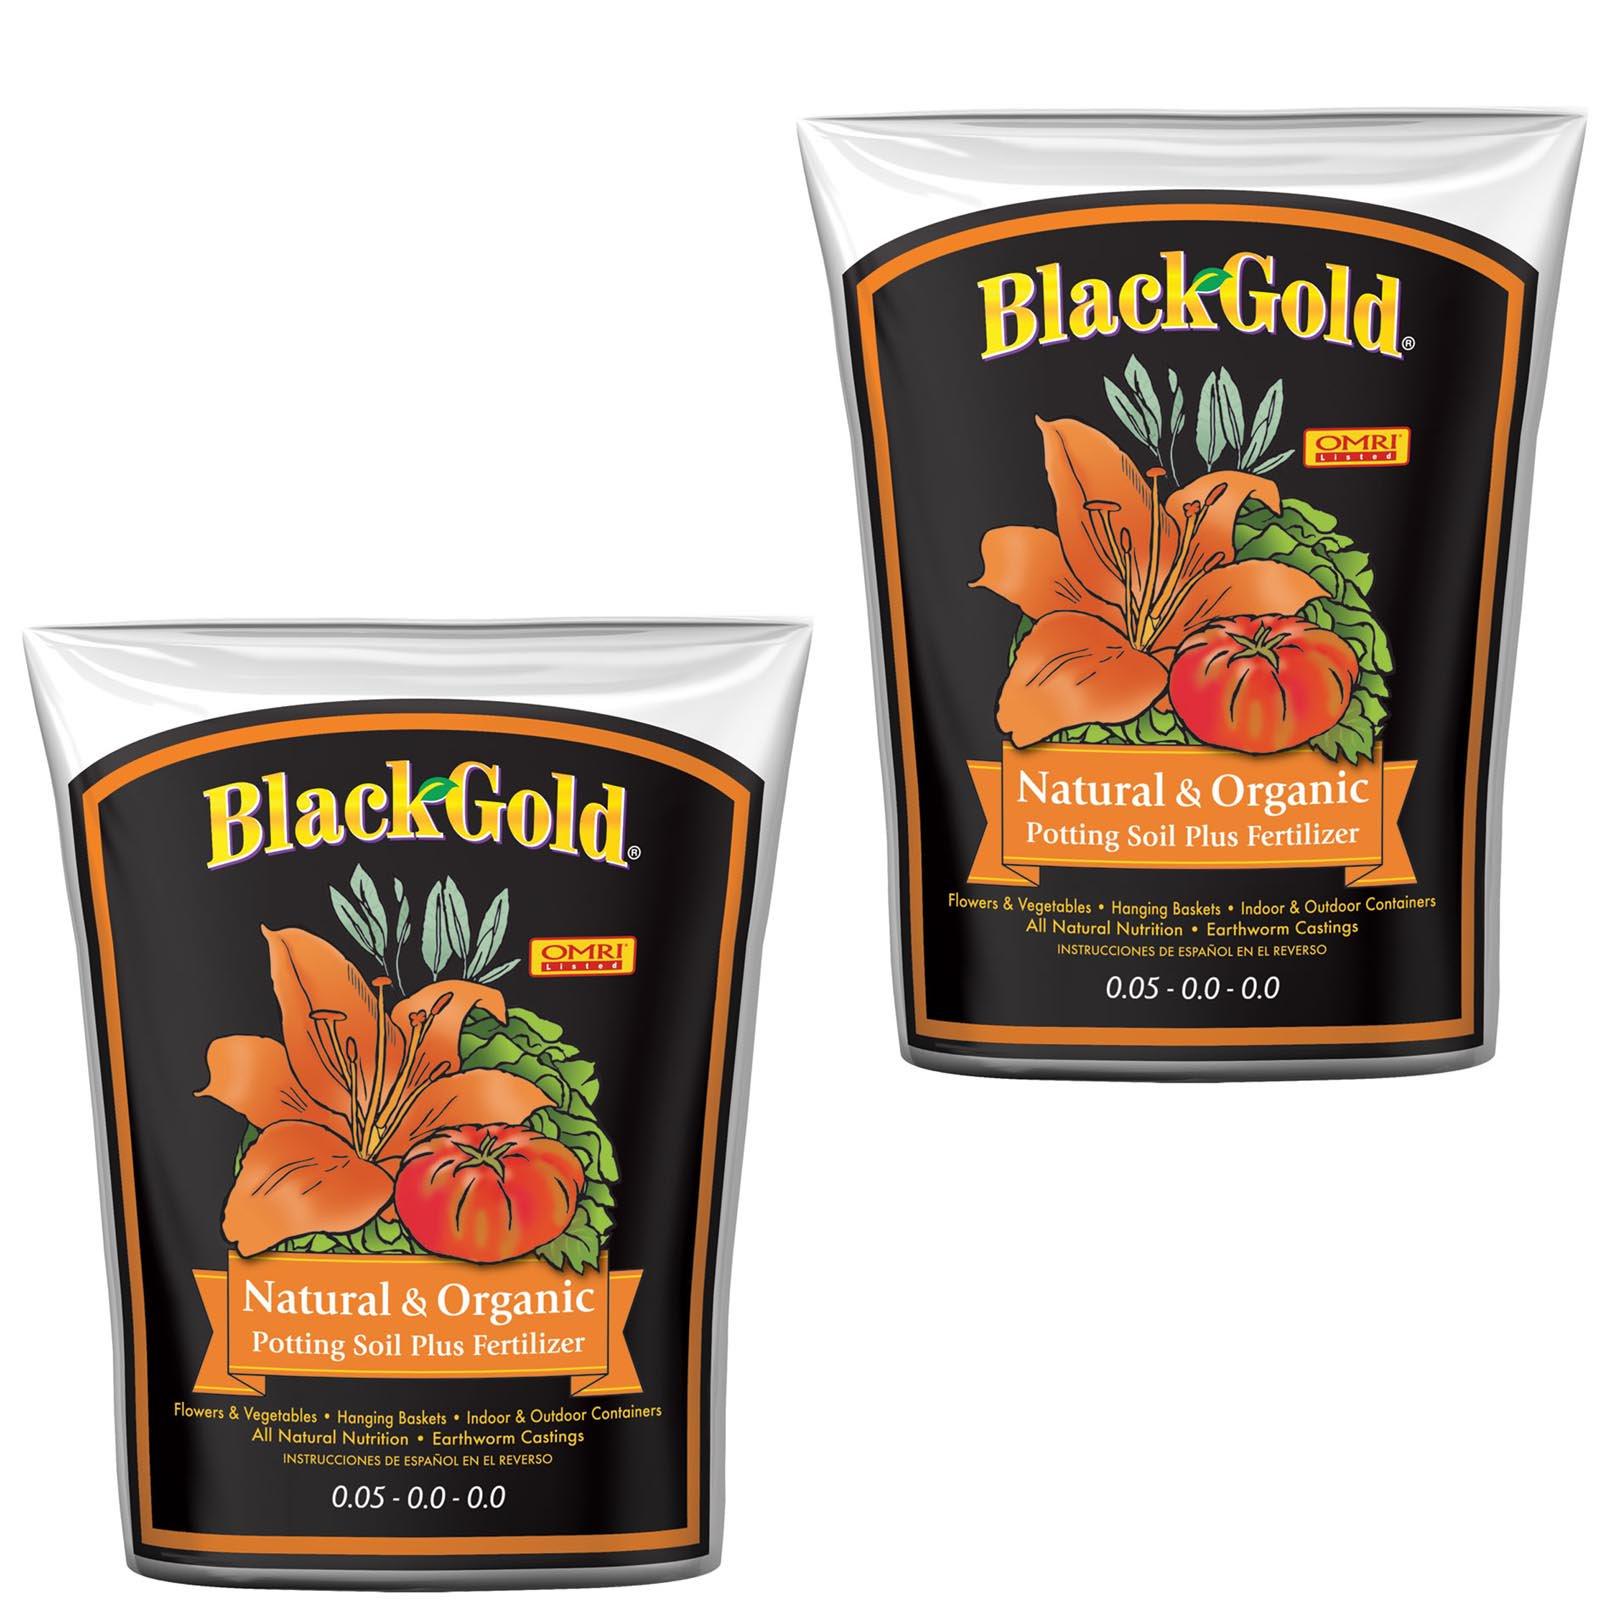 (2) SunGro Black Gold Natural & Organic Potting Soil/Fertilizer Bags | 4 cu ft.